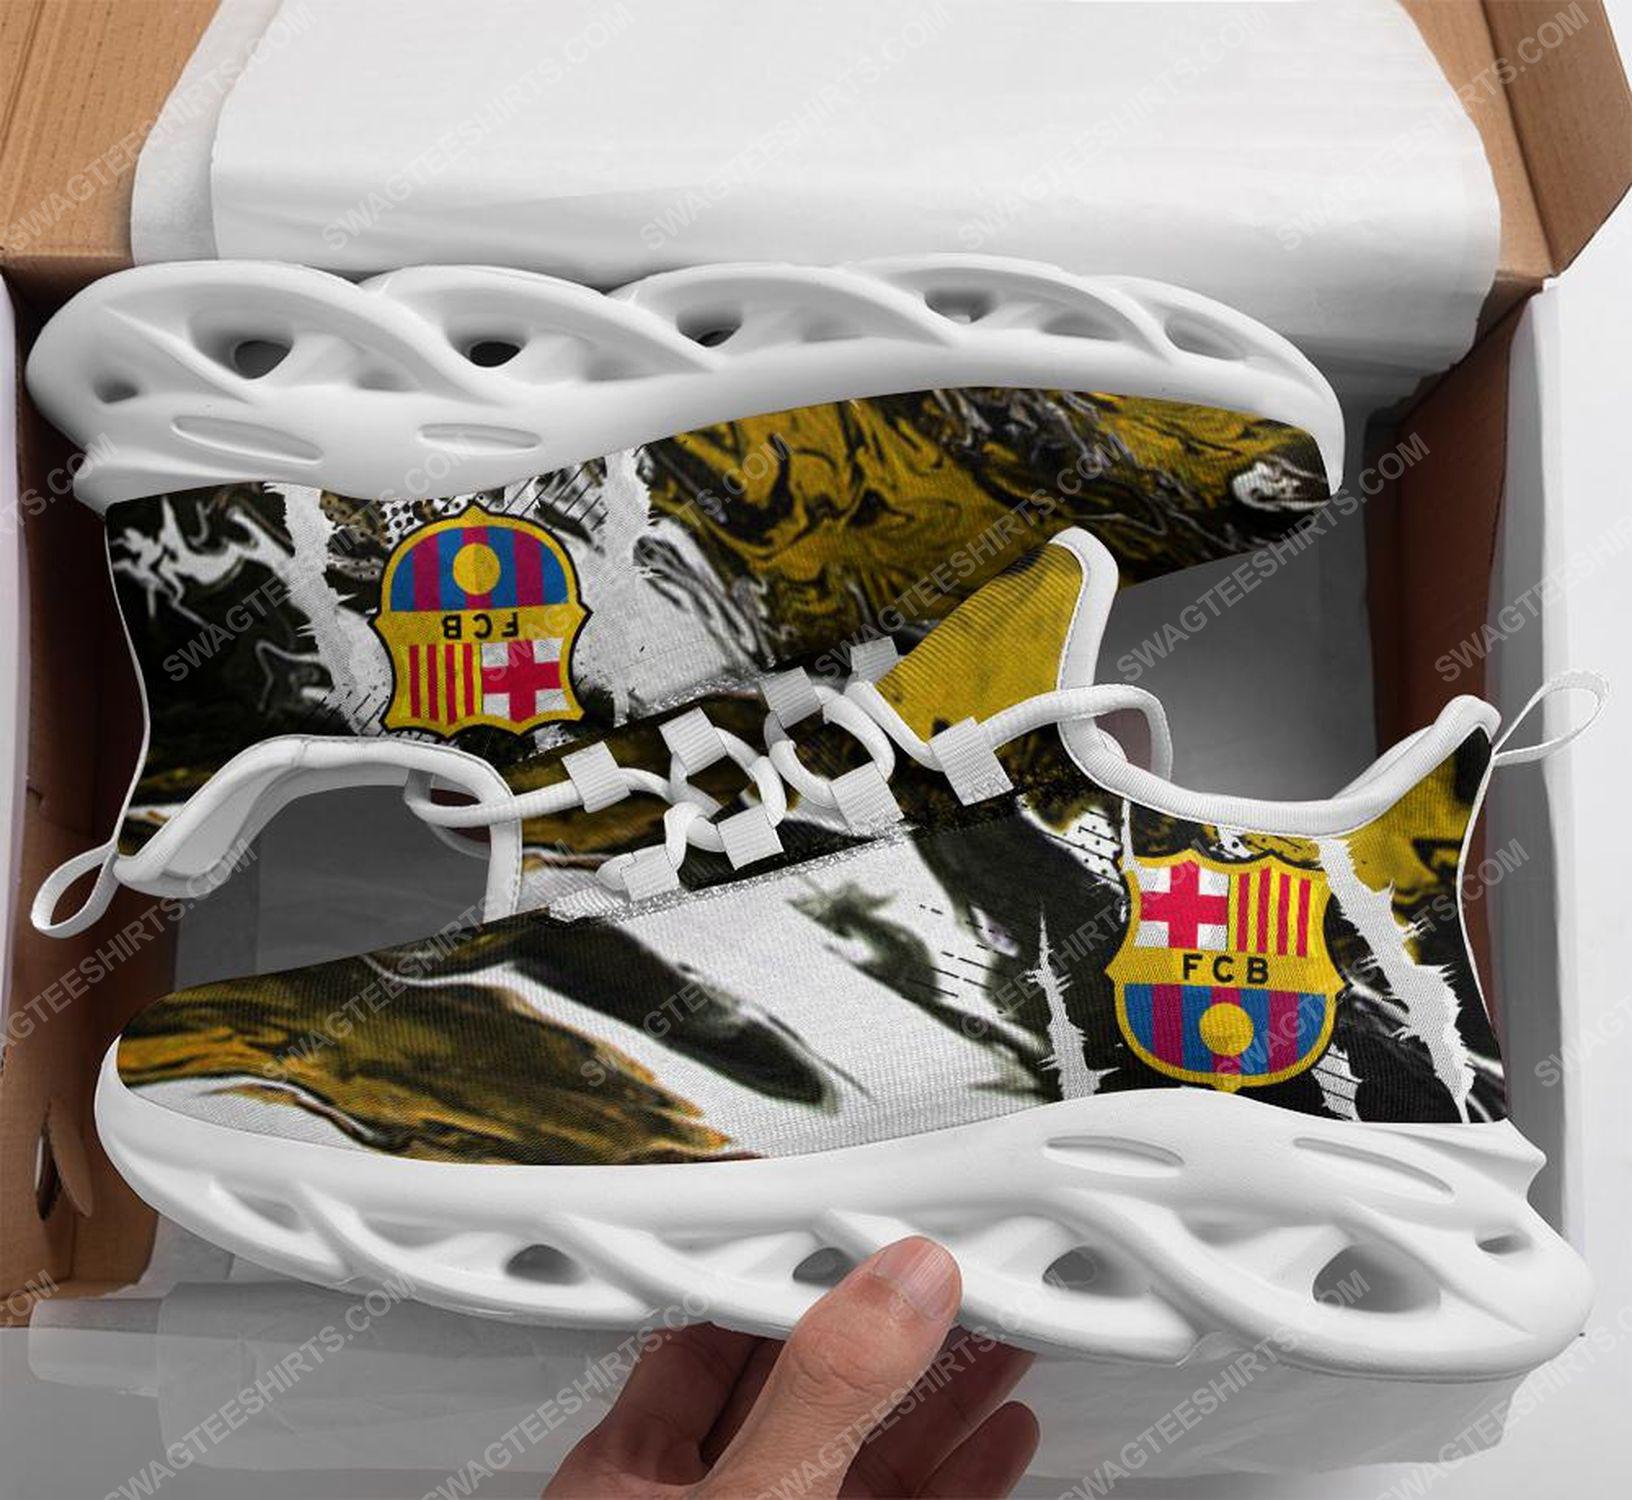 Football club barcelona max soul shoes 1